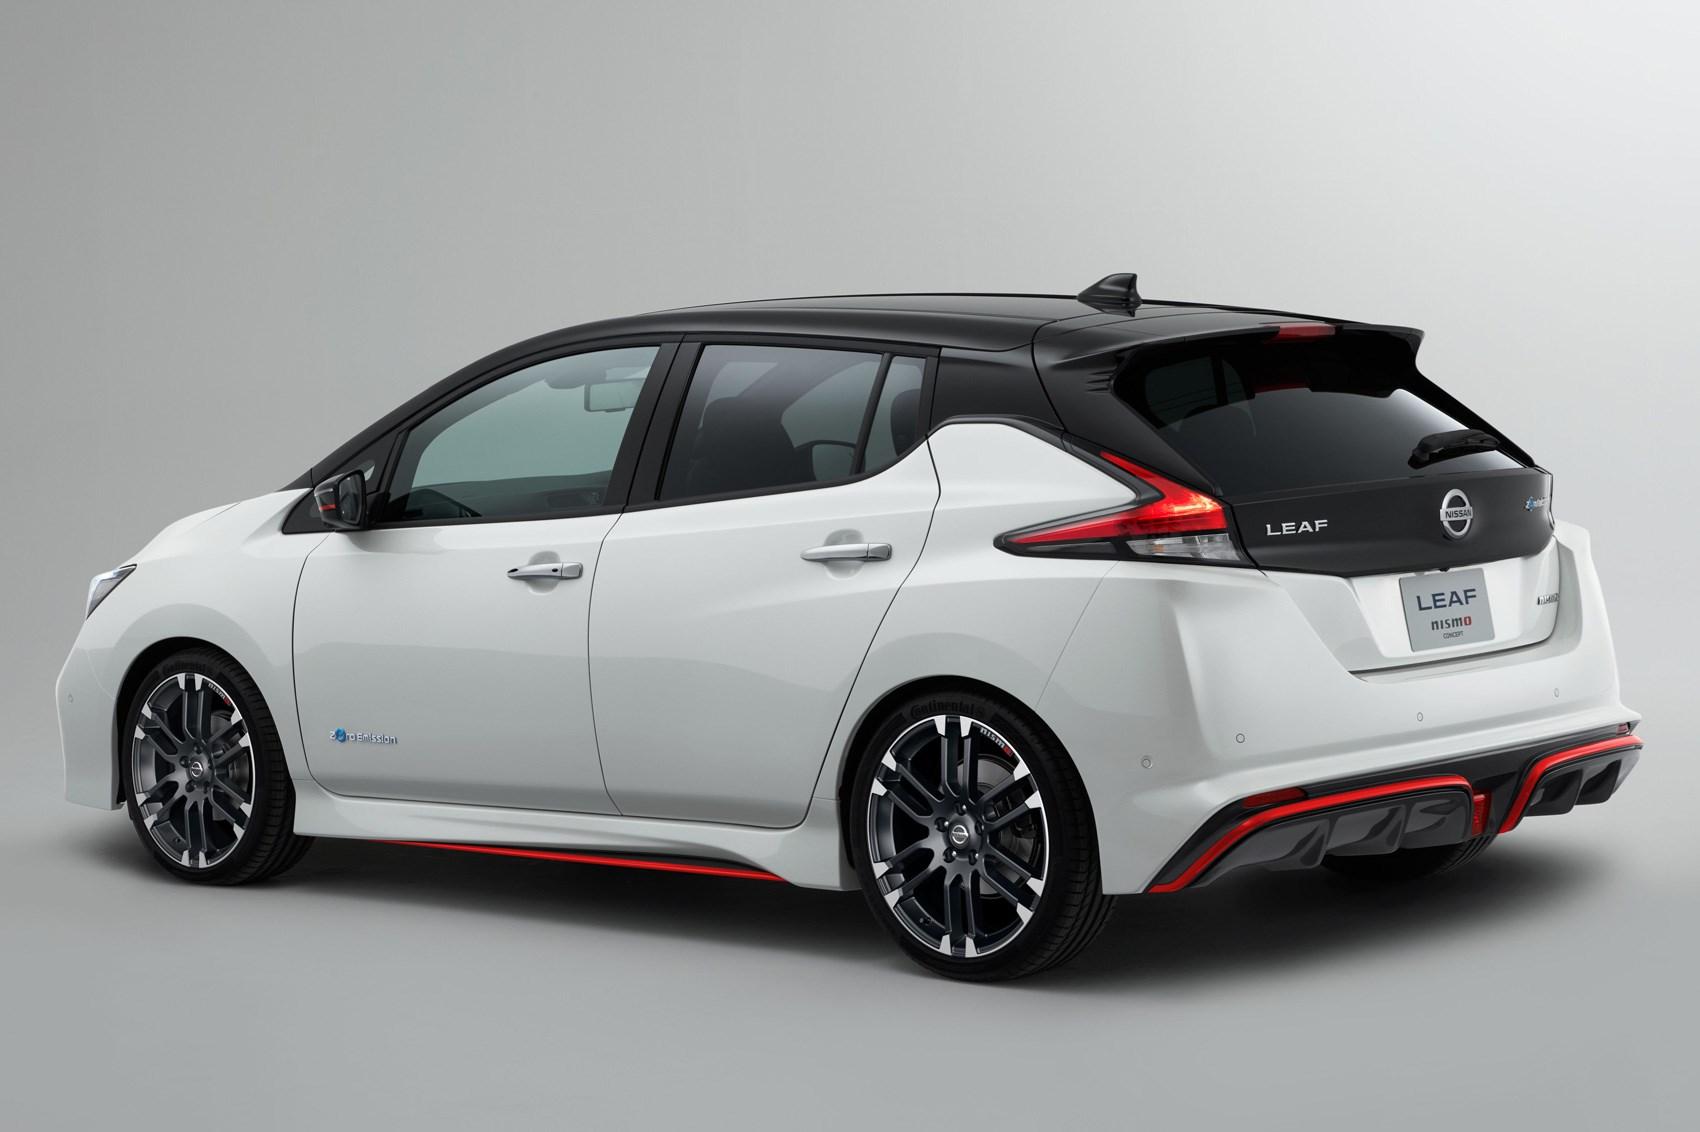 Nismo Nissan Leaf Concept Confirmed For 2017 Tokyo Show Car Magazine